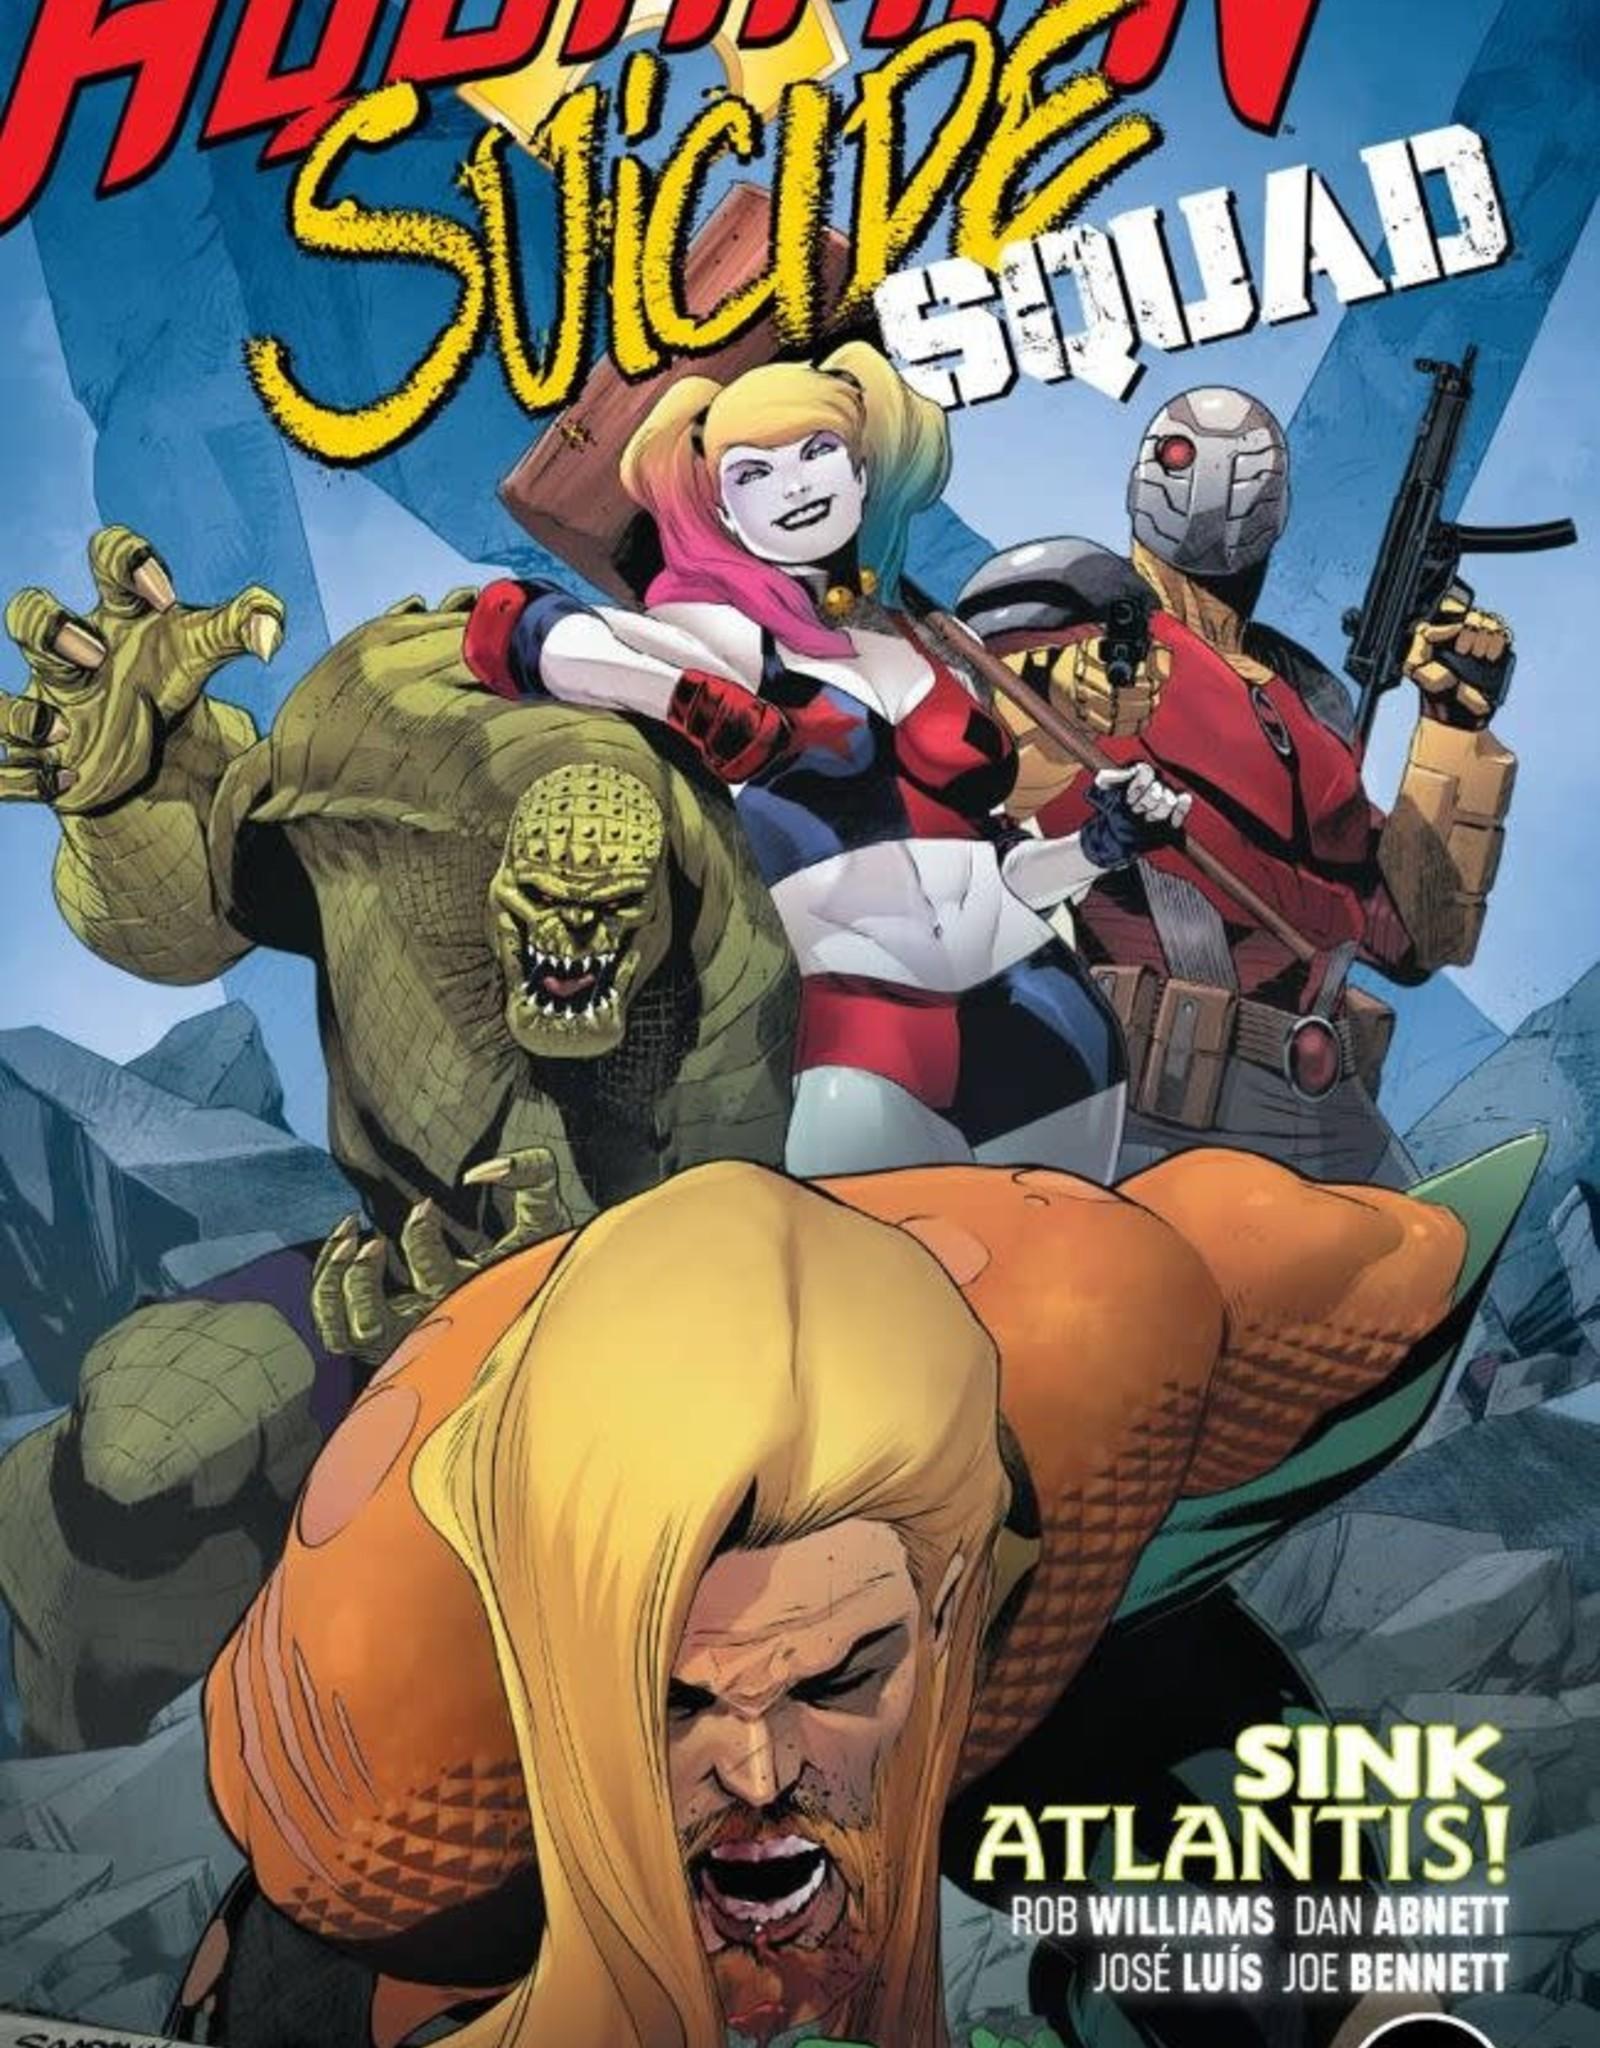 DC Comics Aquaman/Suicide Squad: Sink Atlantis! TP